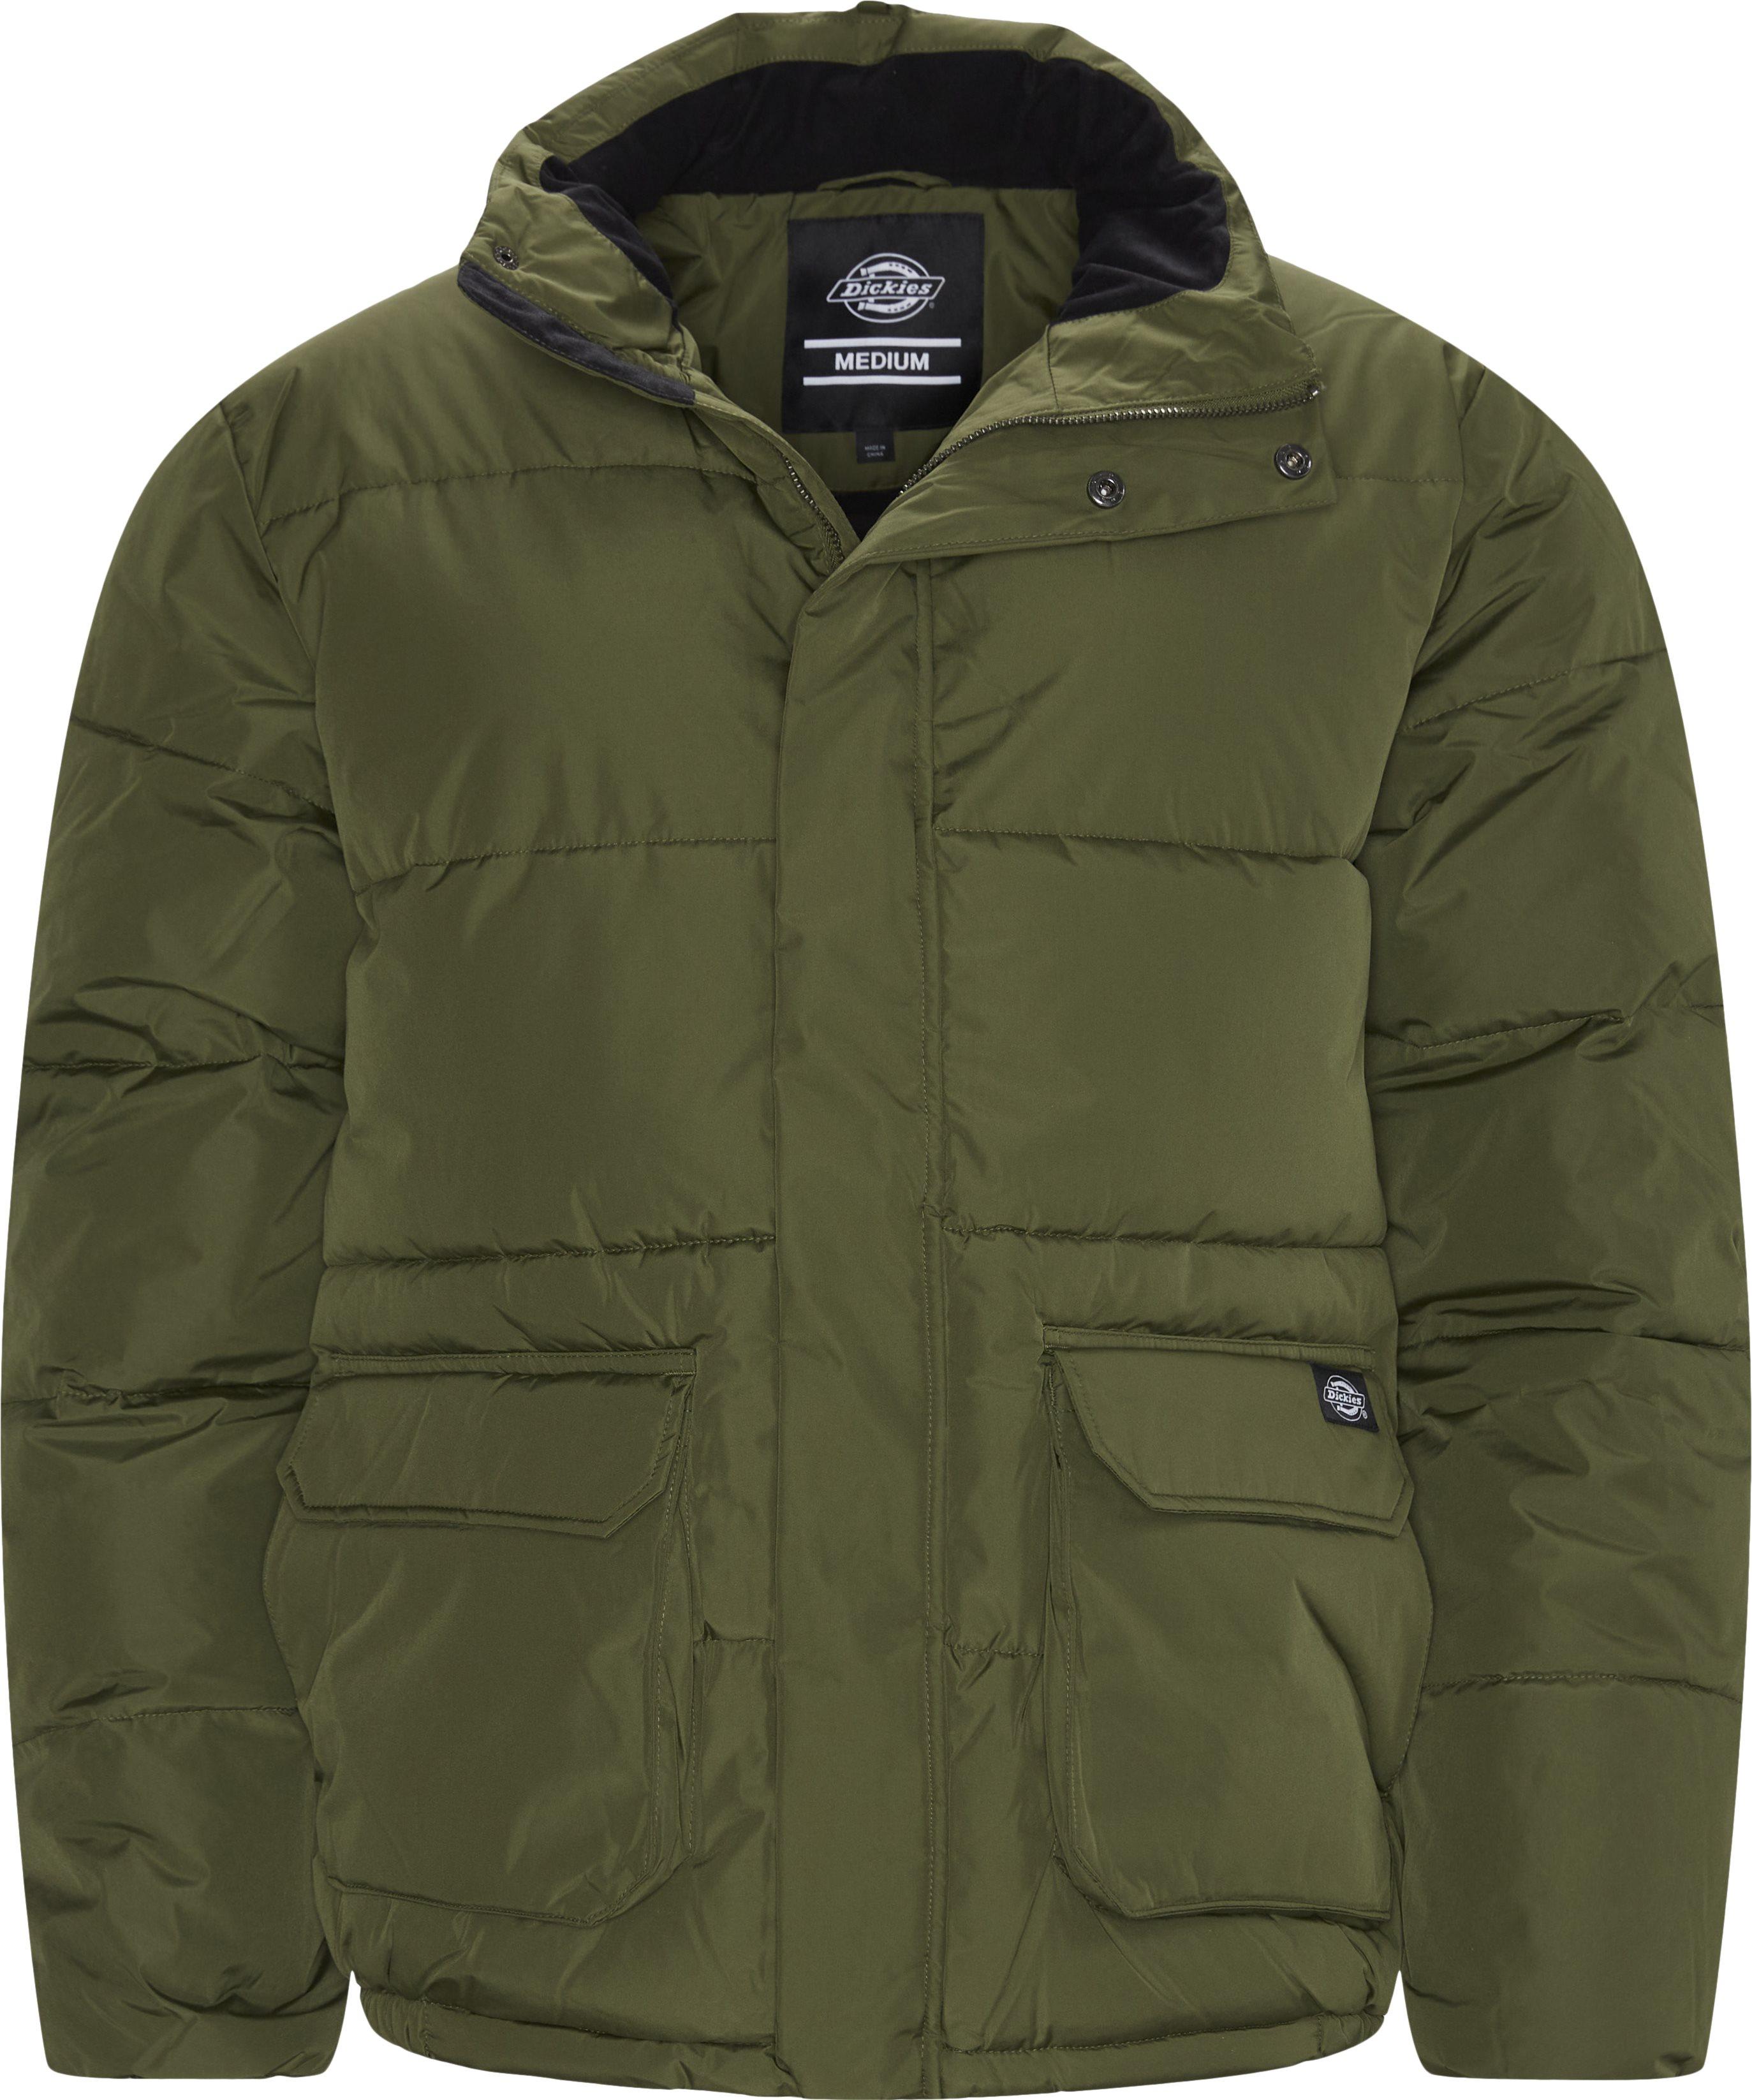 Olaton Puffa Jacket - Jackets - Regular - Green